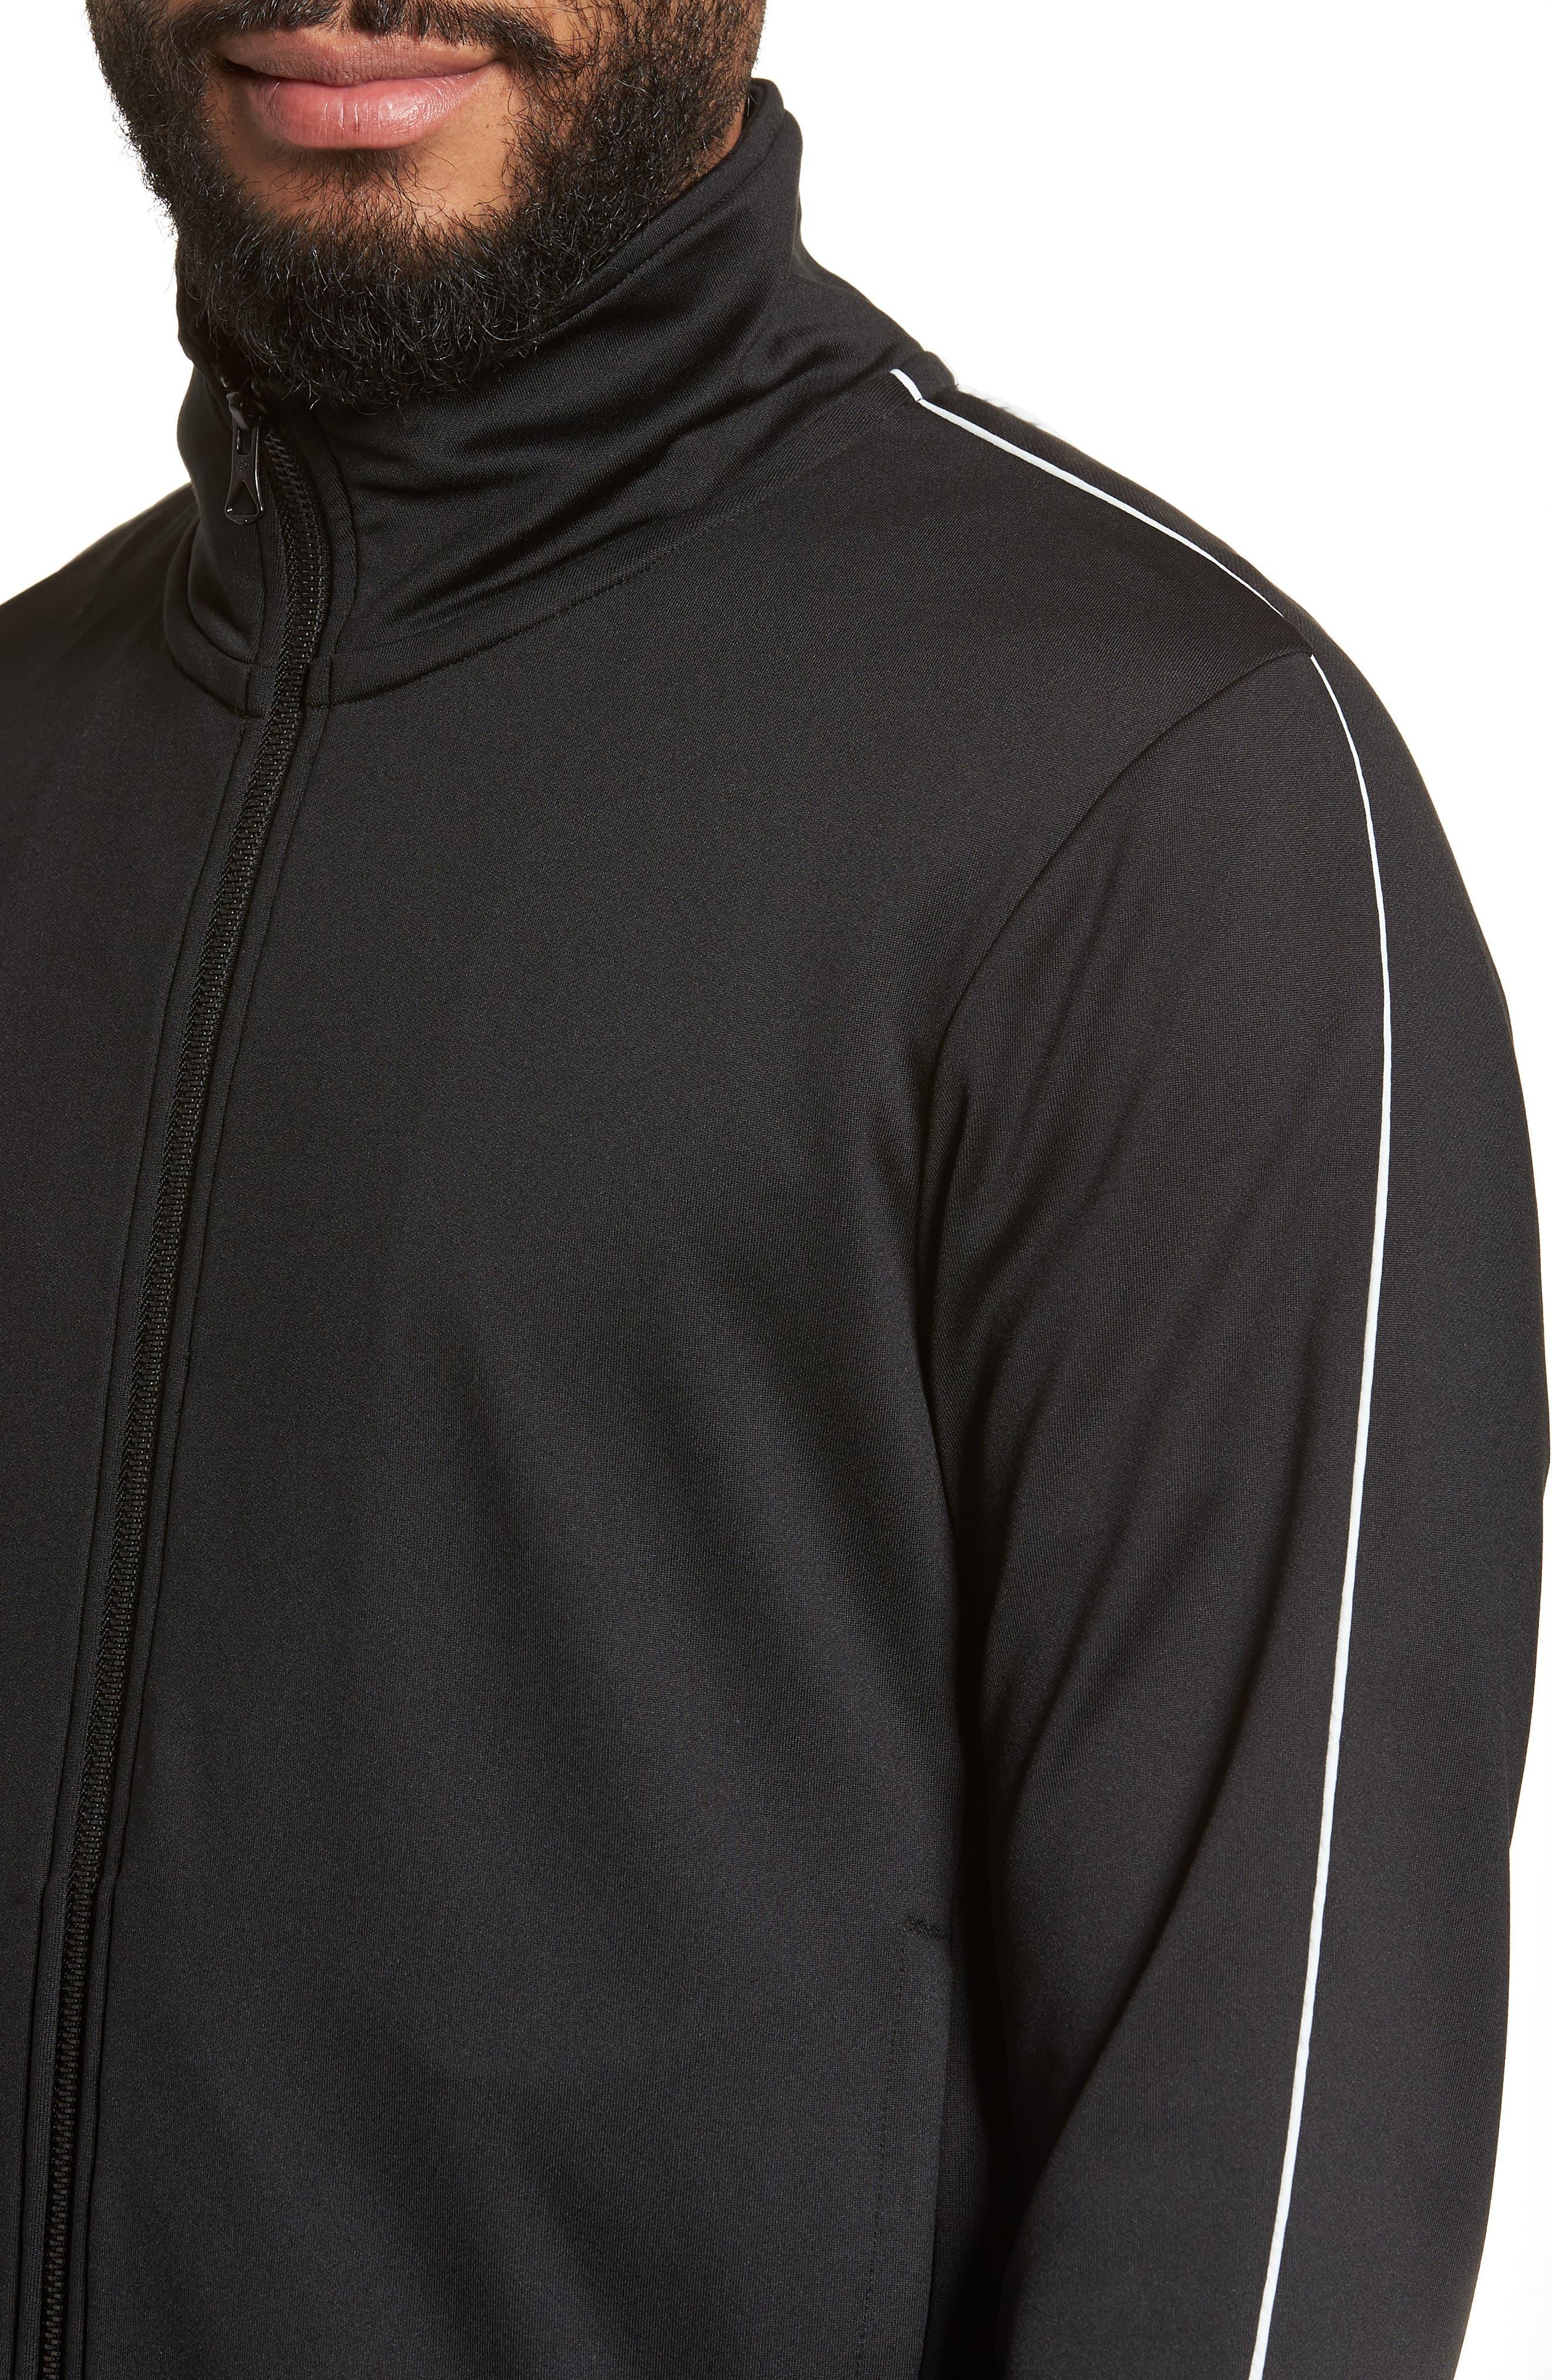 CoolMax<sup>®</sup> Track Jacket,                             Alternate thumbnail 4, color,                             001